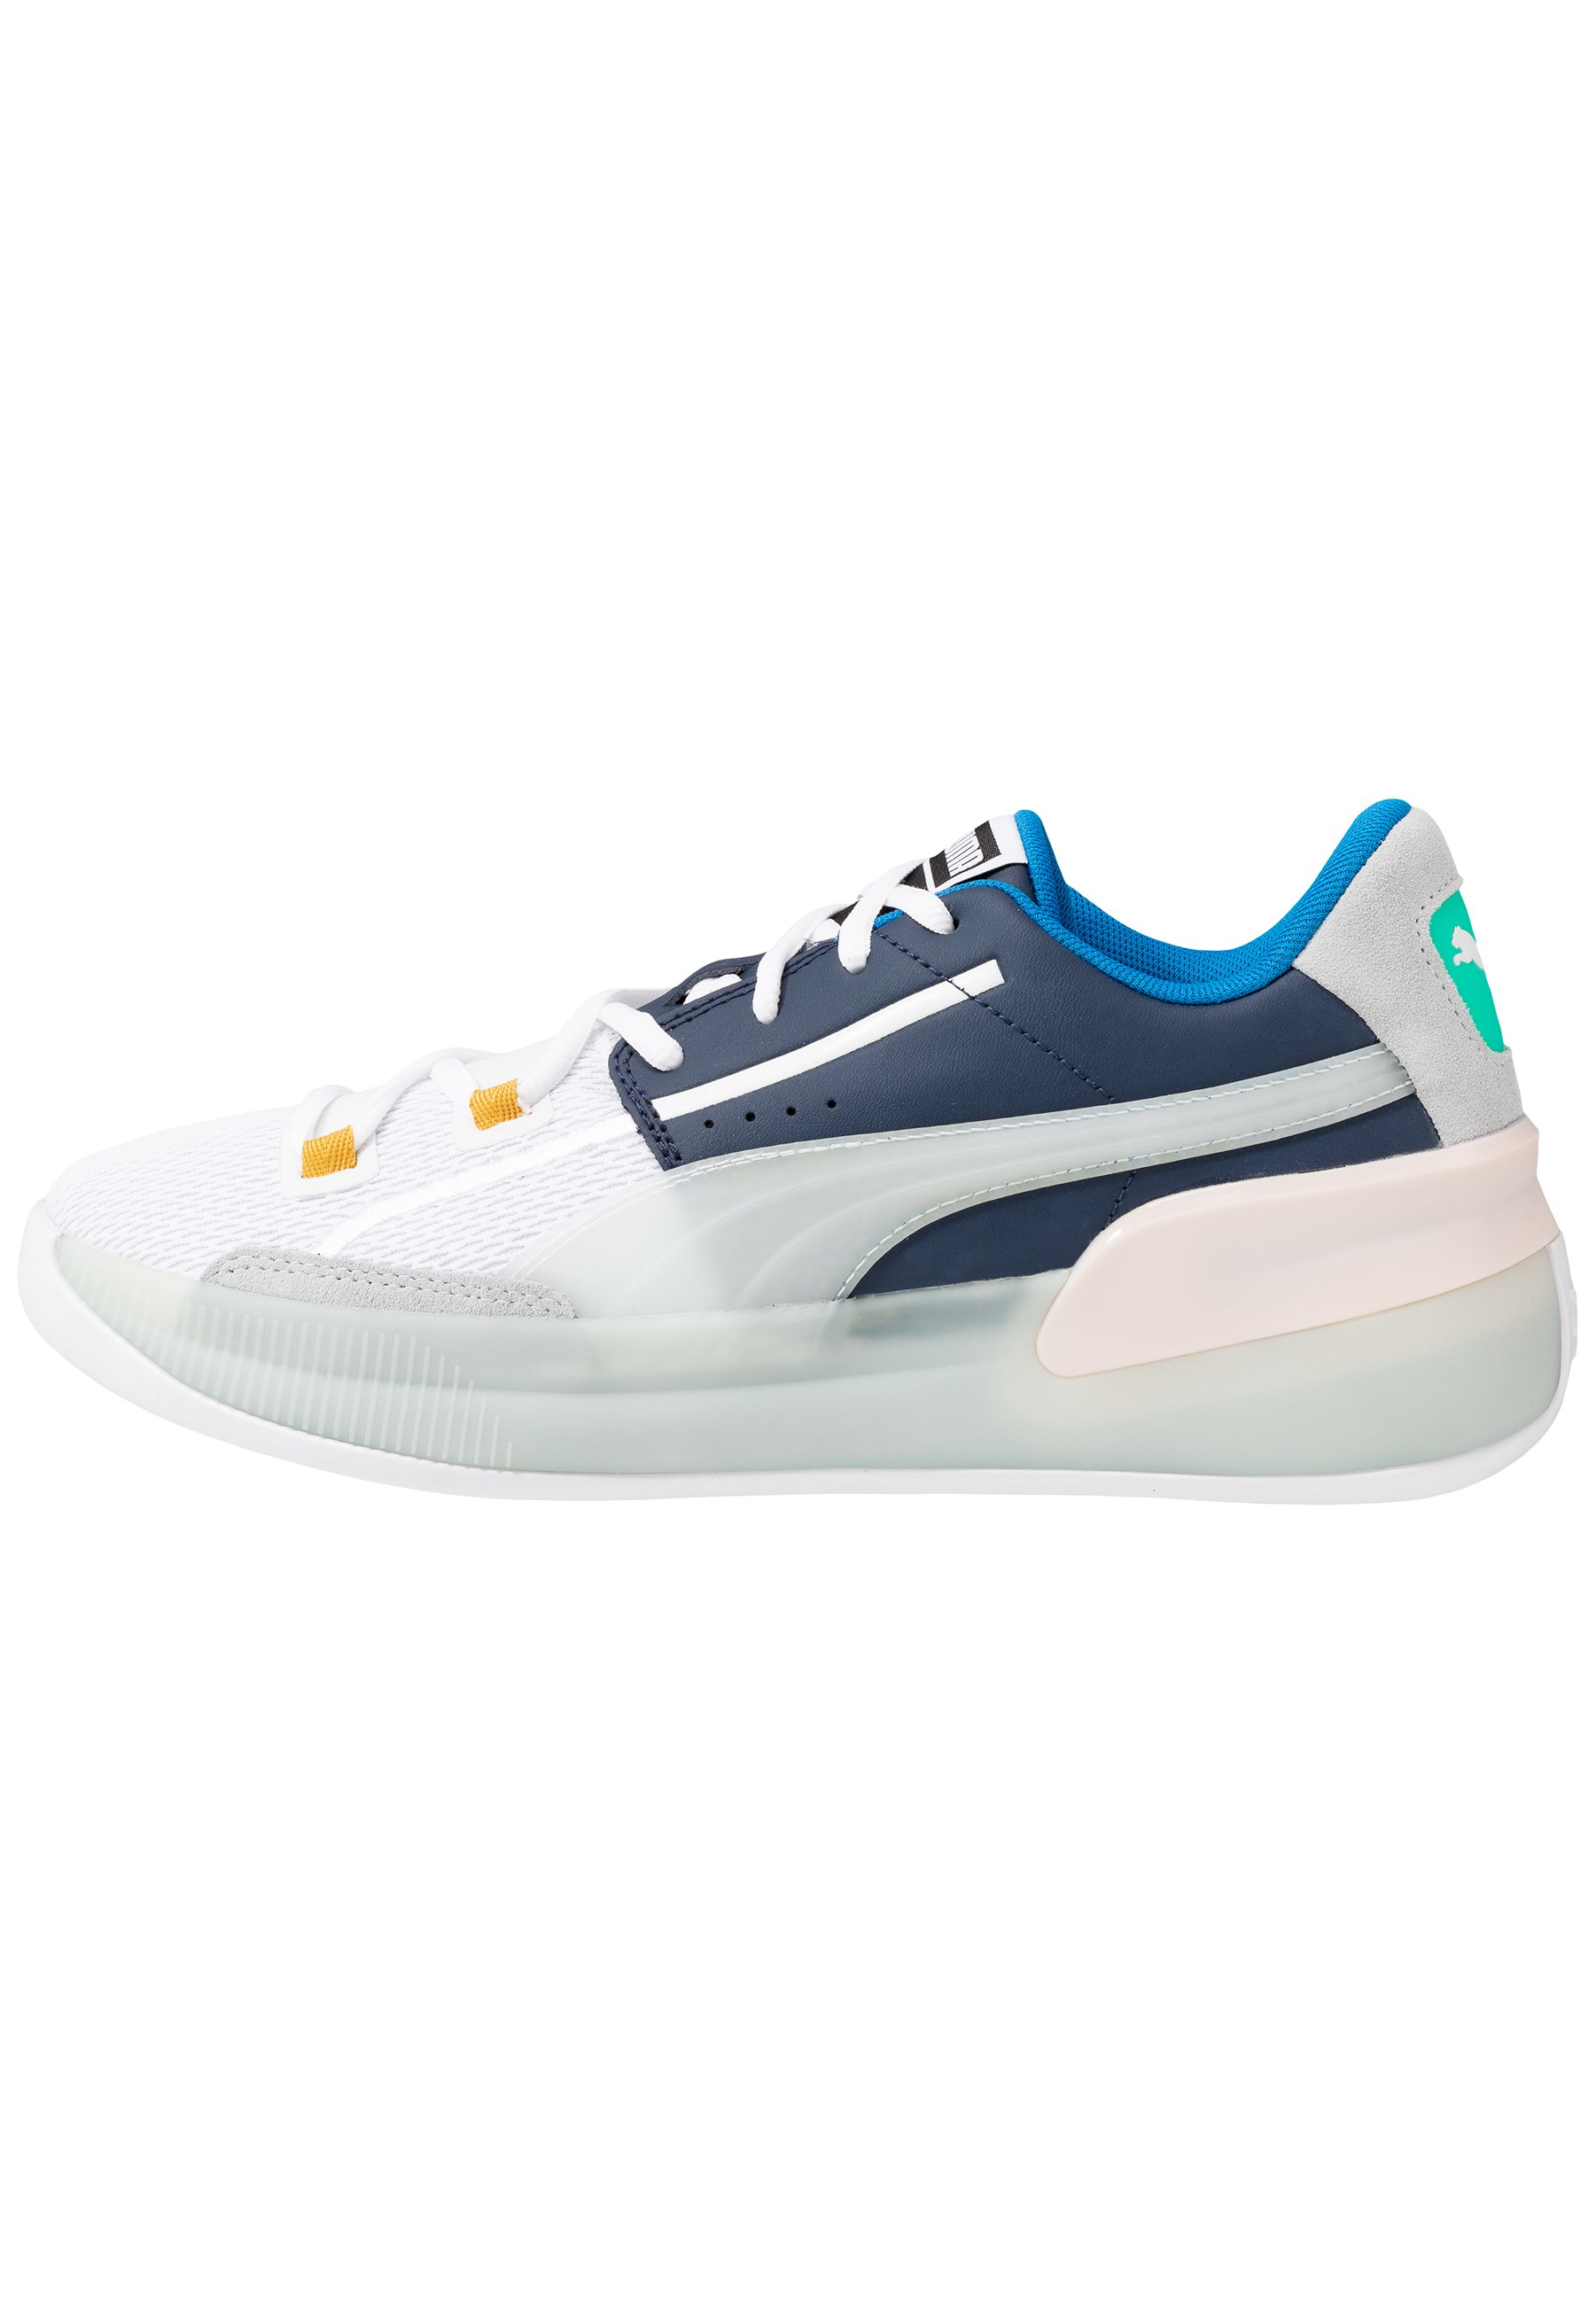 CLYDE HARDWOOD Chaussures de basket white